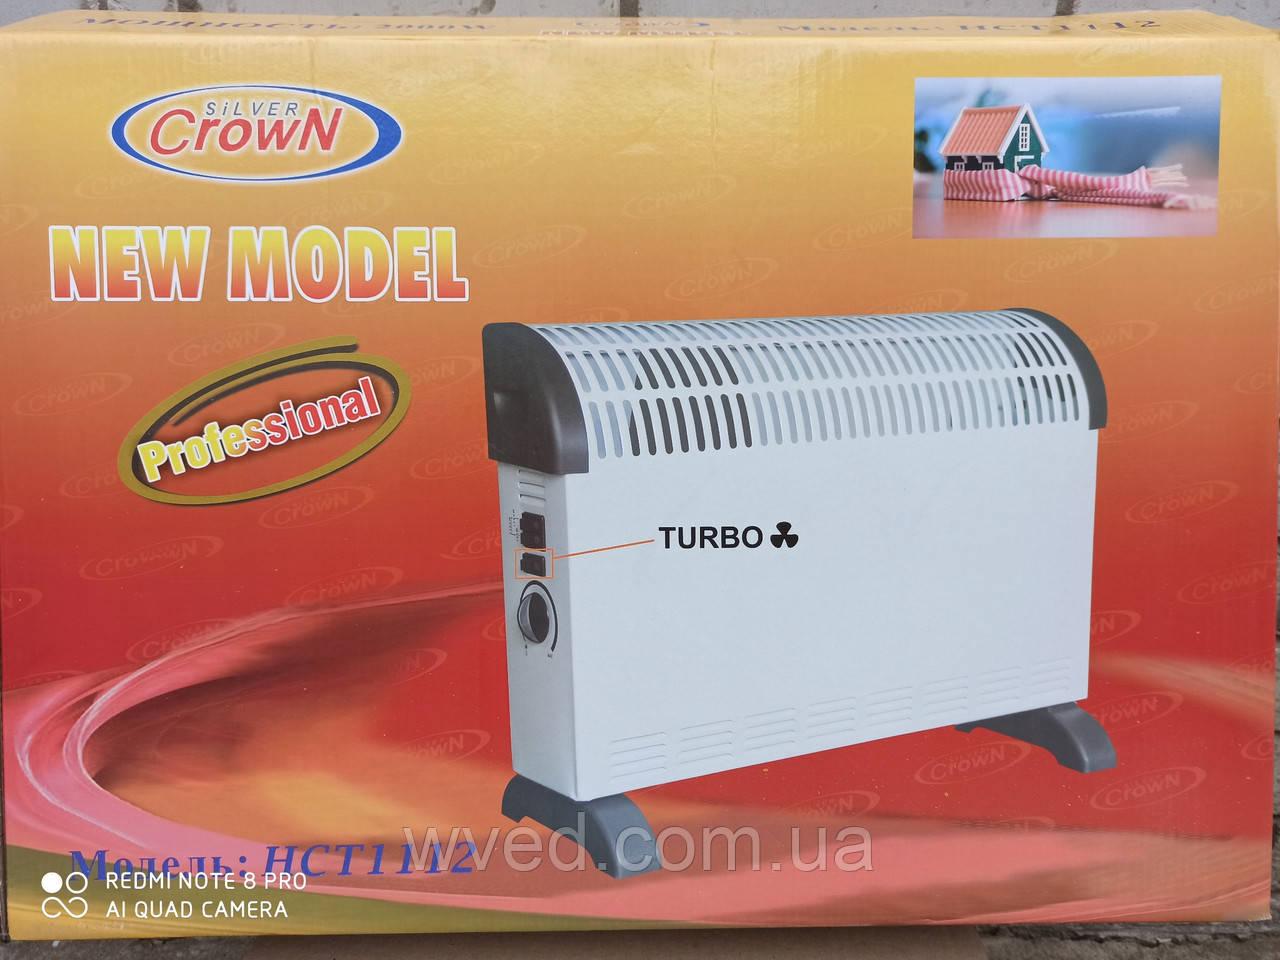 Конвектор CROWN TURBO (2 кВт с вентилятором)